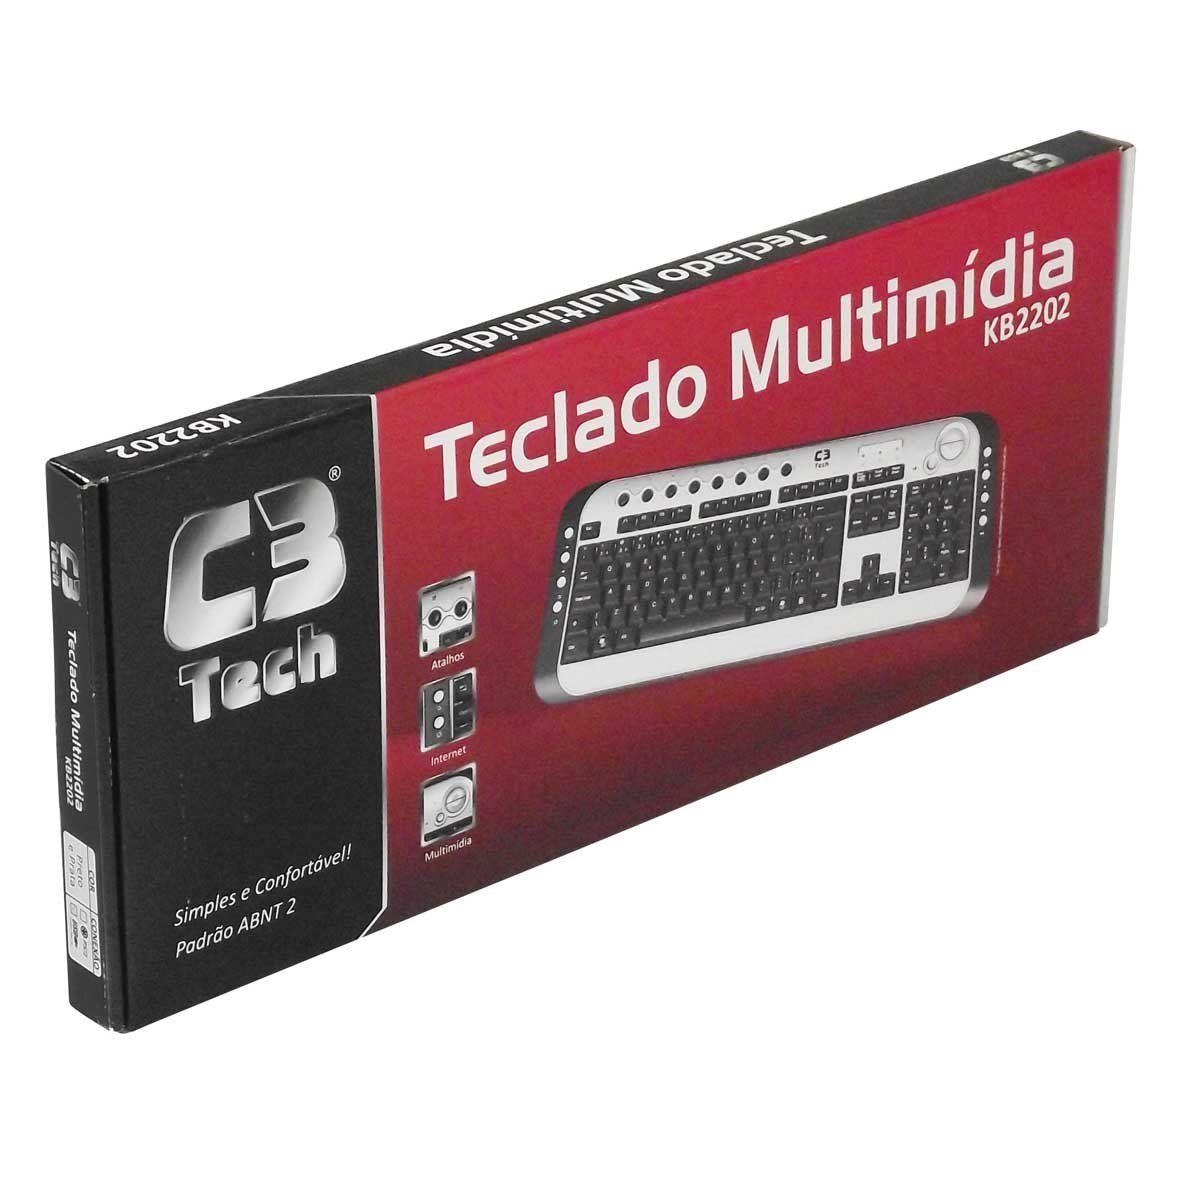 Teclado USB Multimídia Slim Preto C3tech KB2202-2 BK